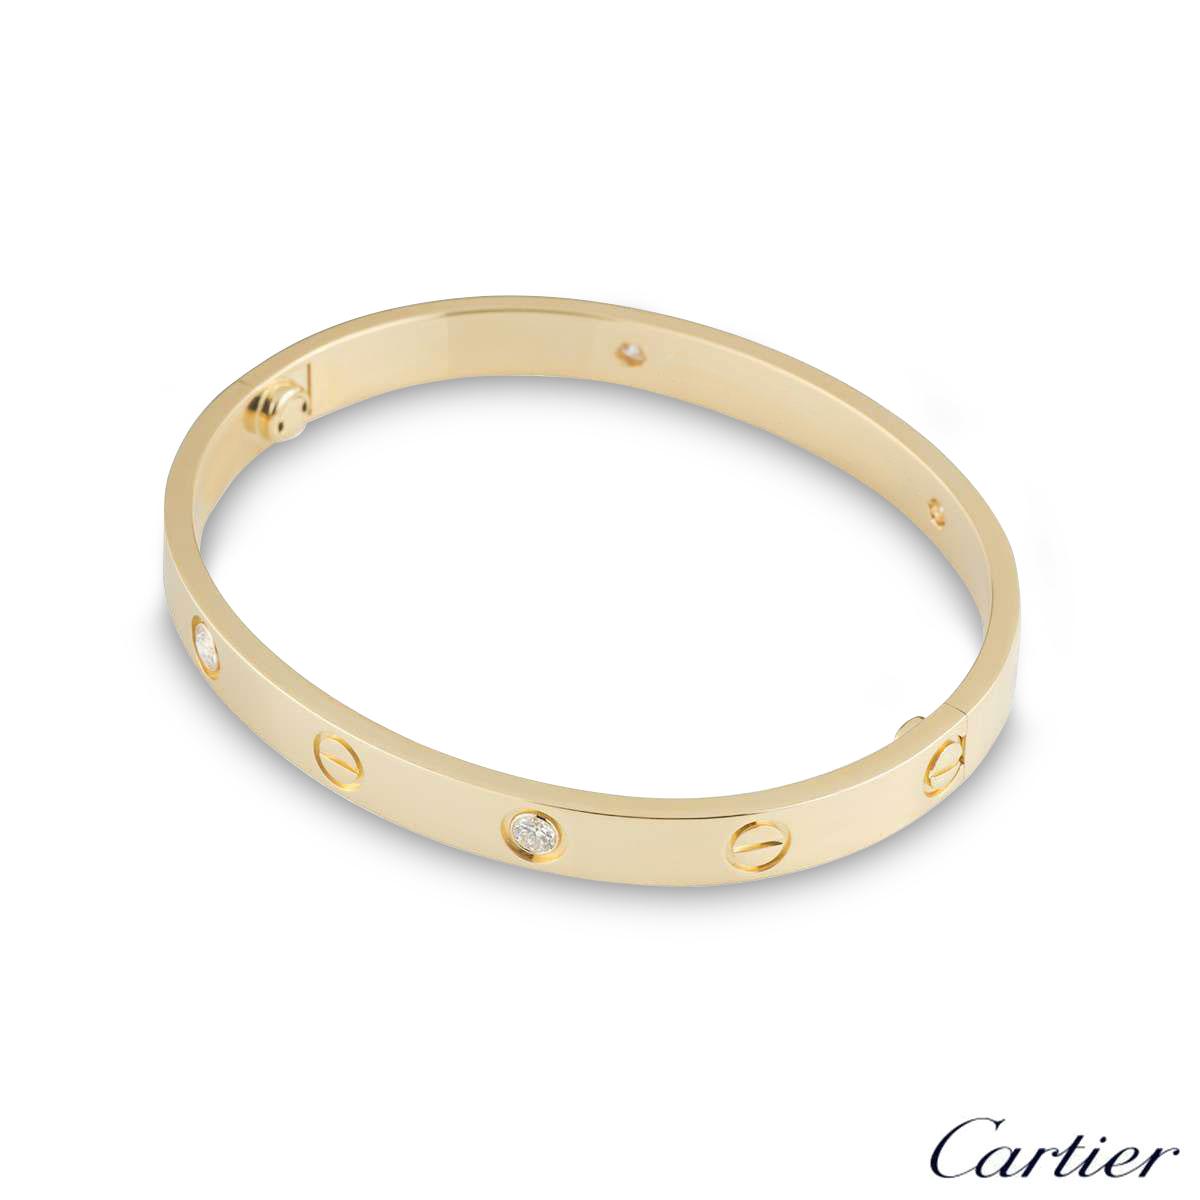 Cartier Yellow Gold Half Diamond Love Bracelet Size 19 B6035919